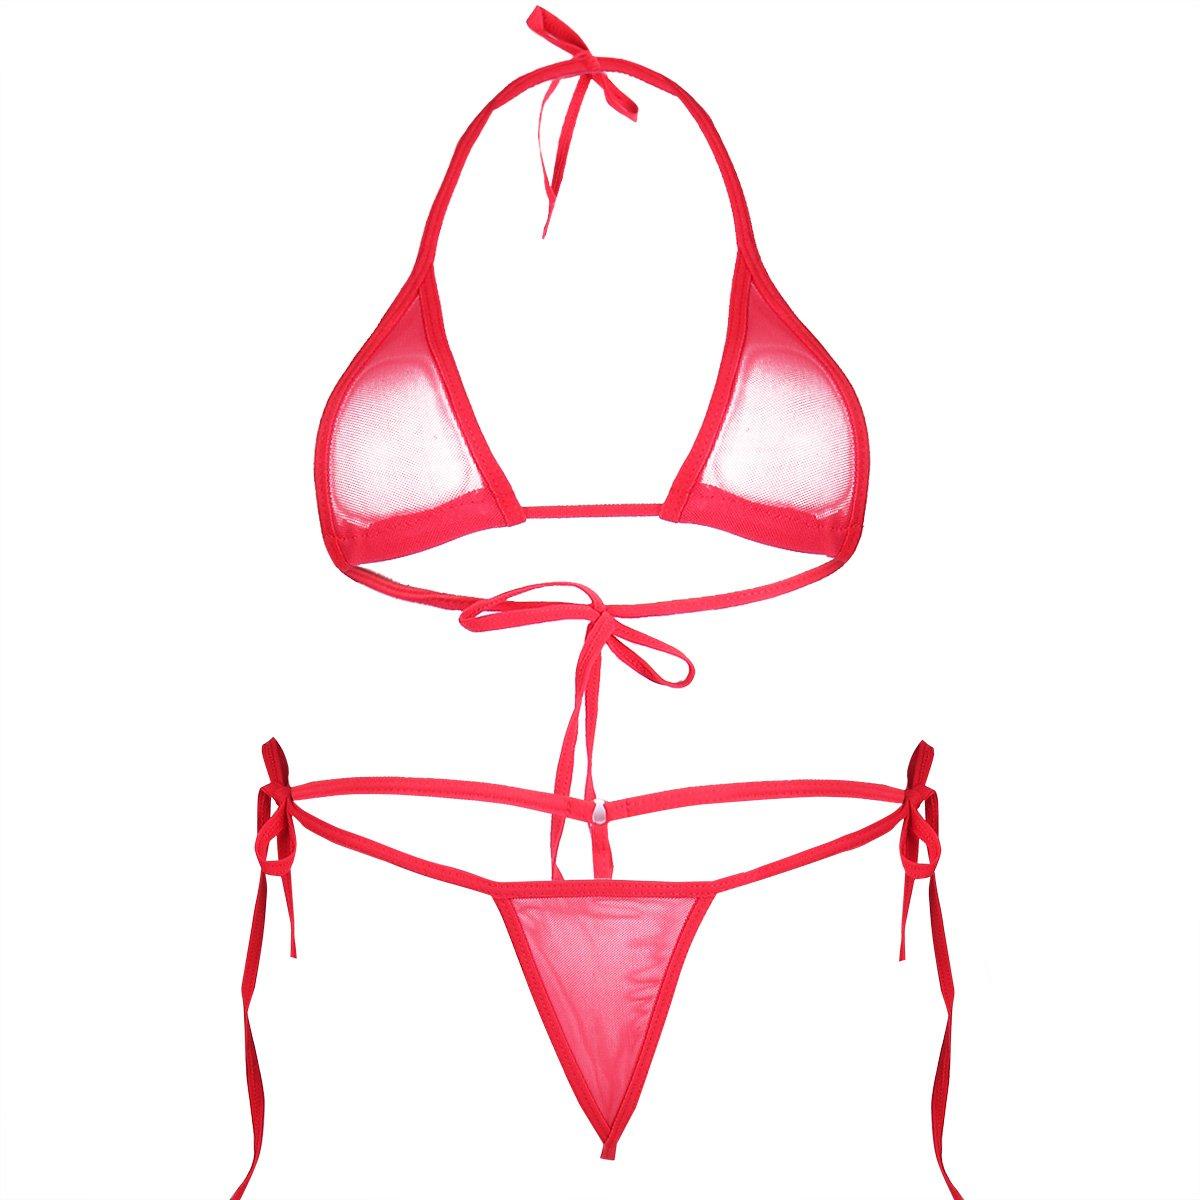 iEFiEL Women Micro G-String Bikini 2 Piece Sliding Top Thong Small Bra (Mesh Red)